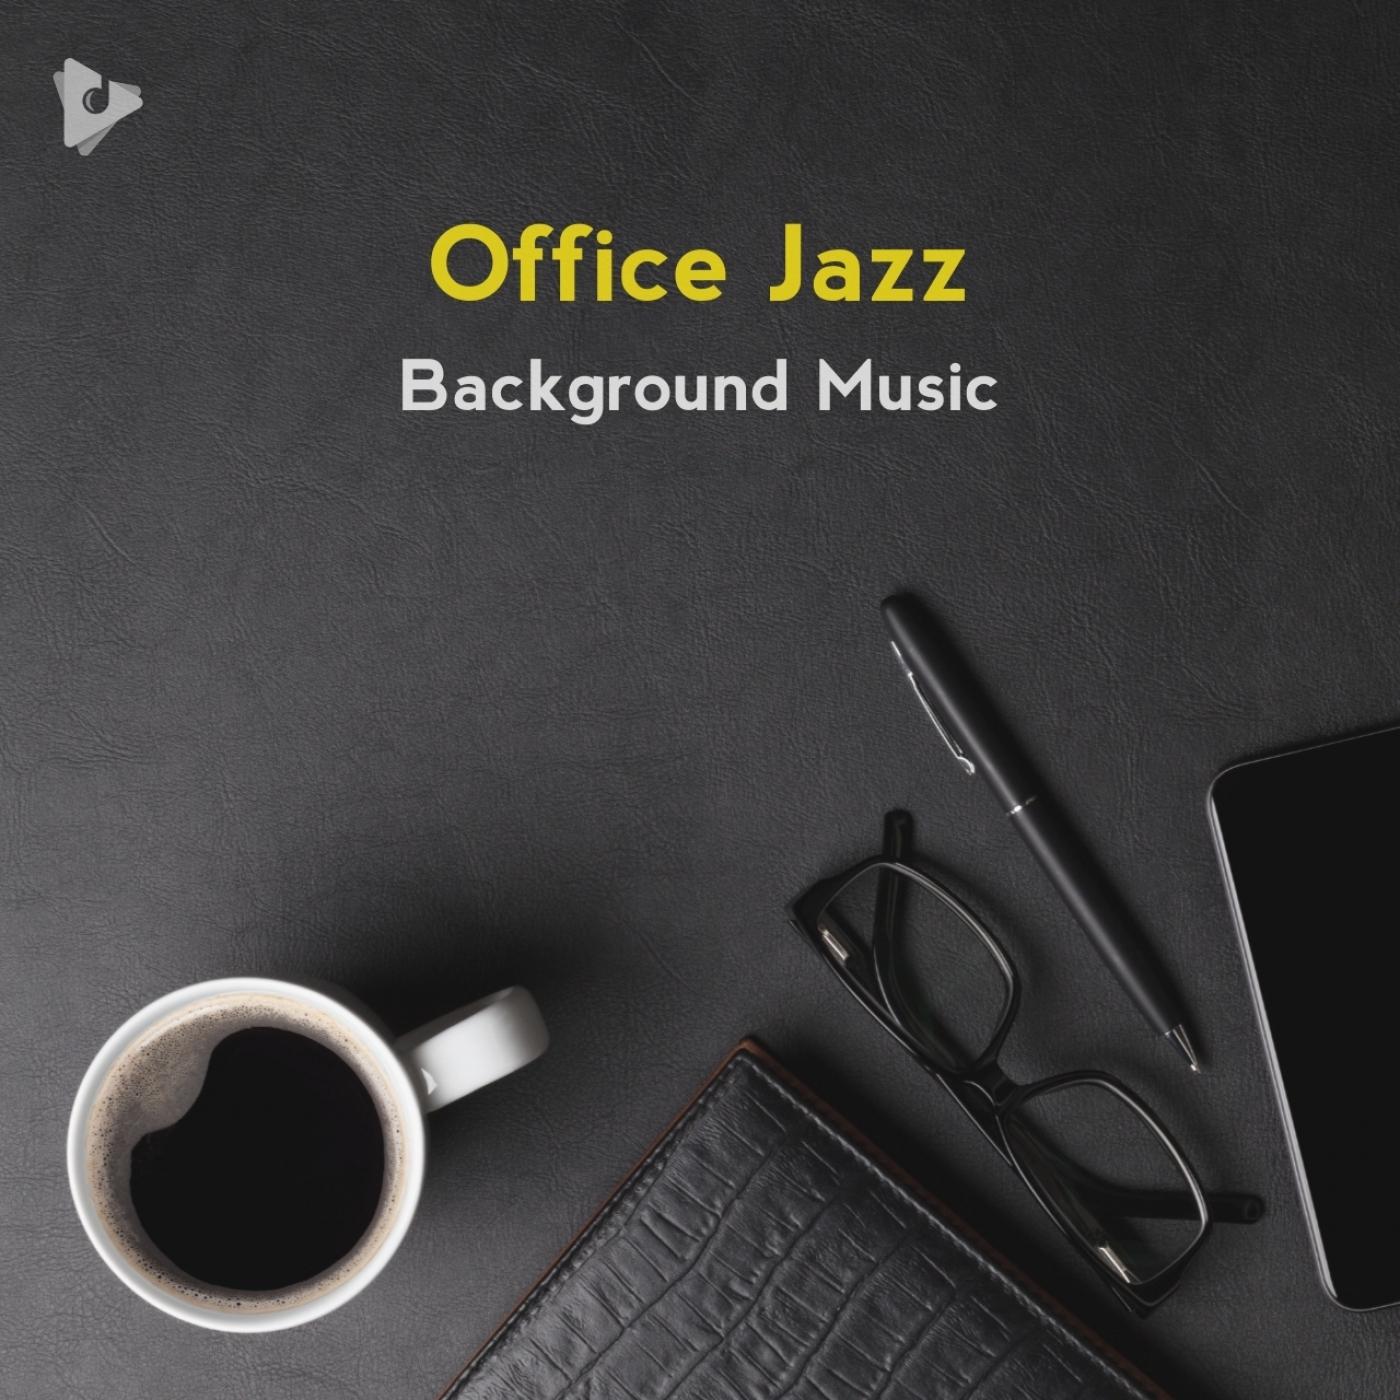 Office Jazz Background Music